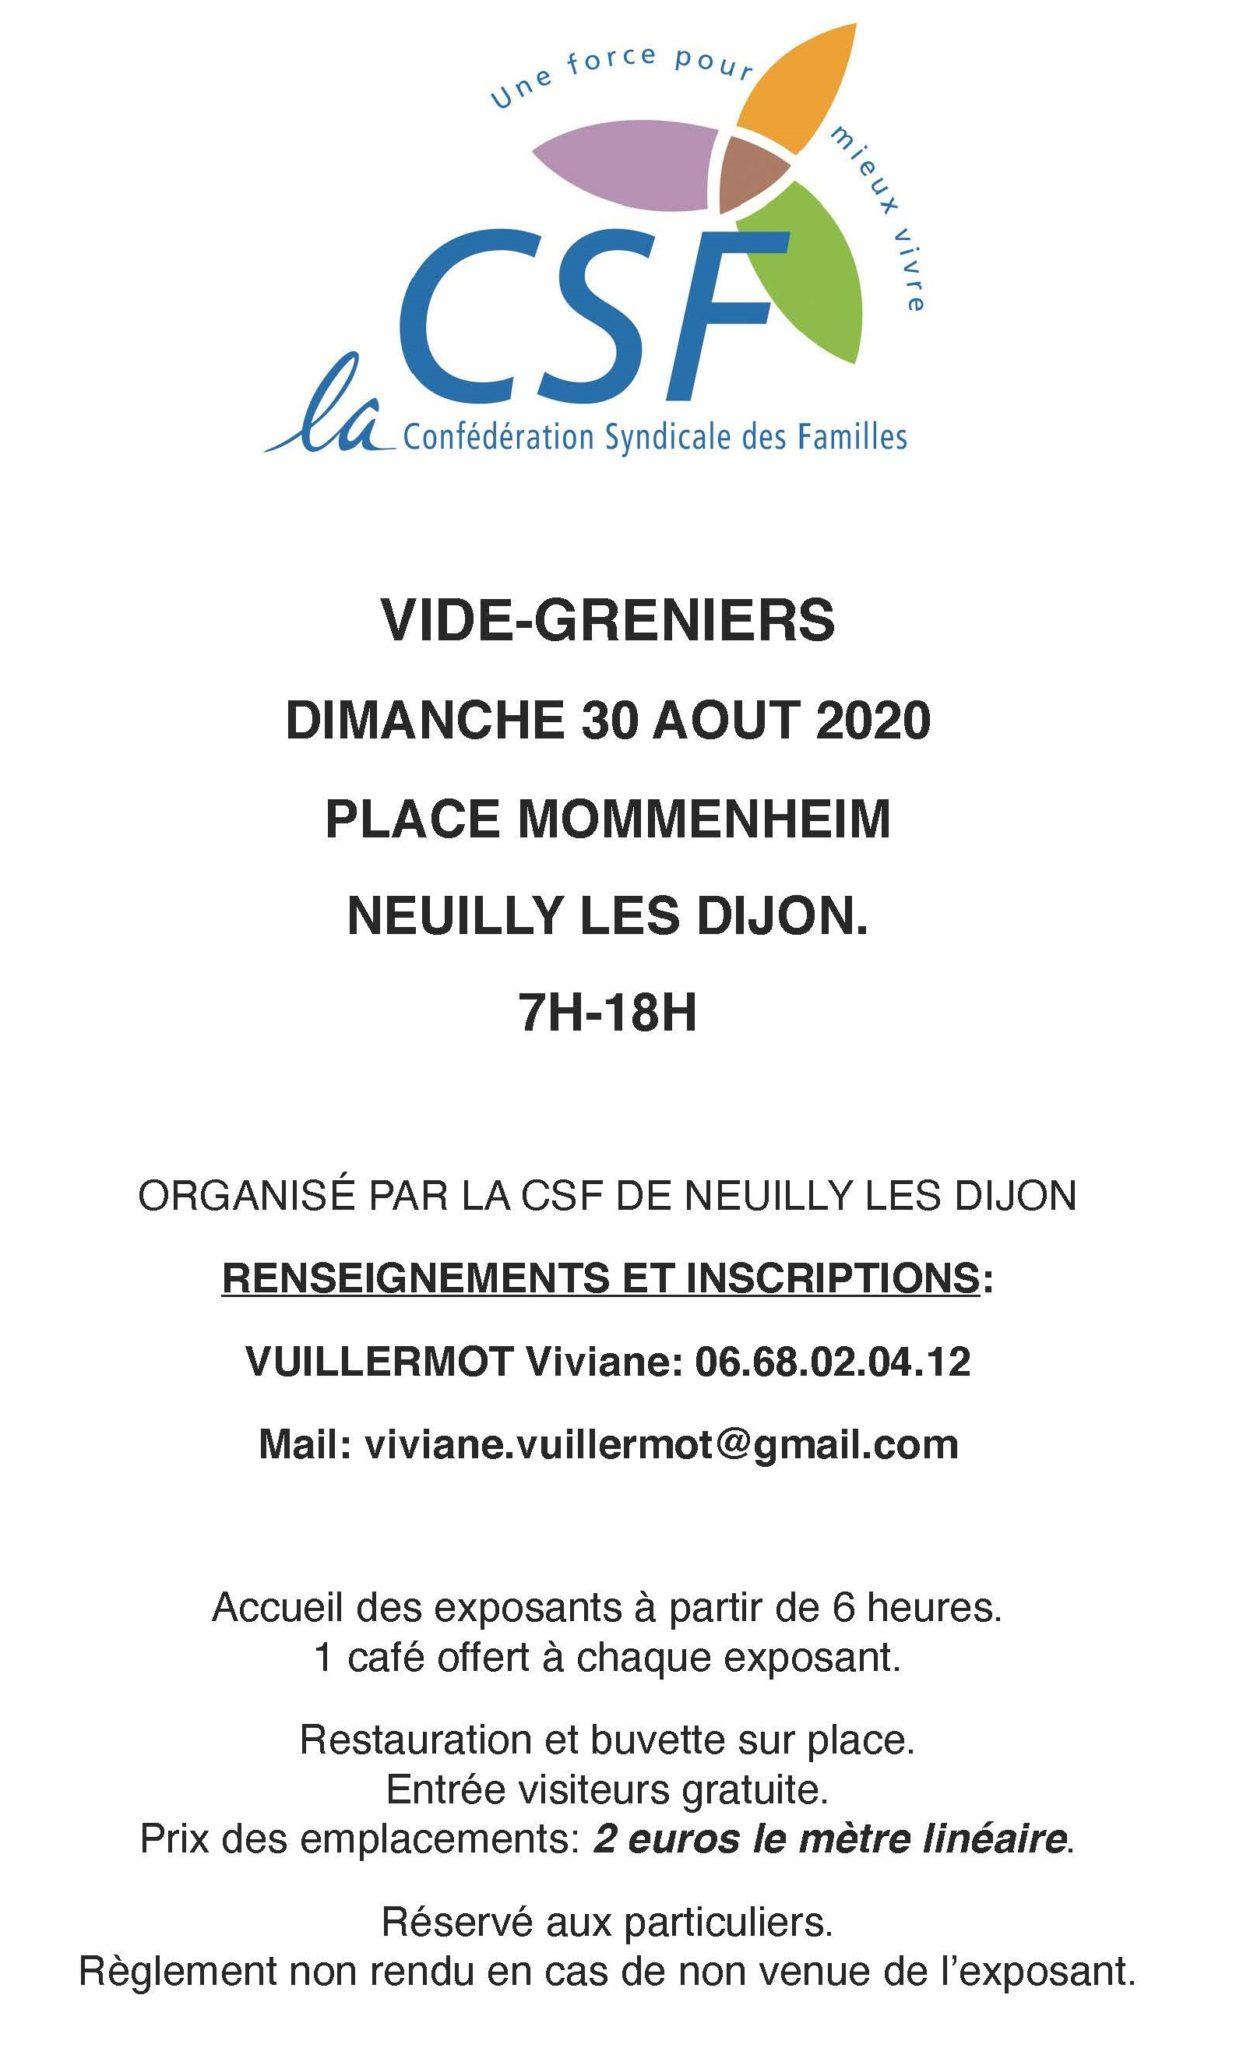 Vide-greniers – dimanche 30 Août – Place Mommenheim à Neuilly-lès-Dijon.